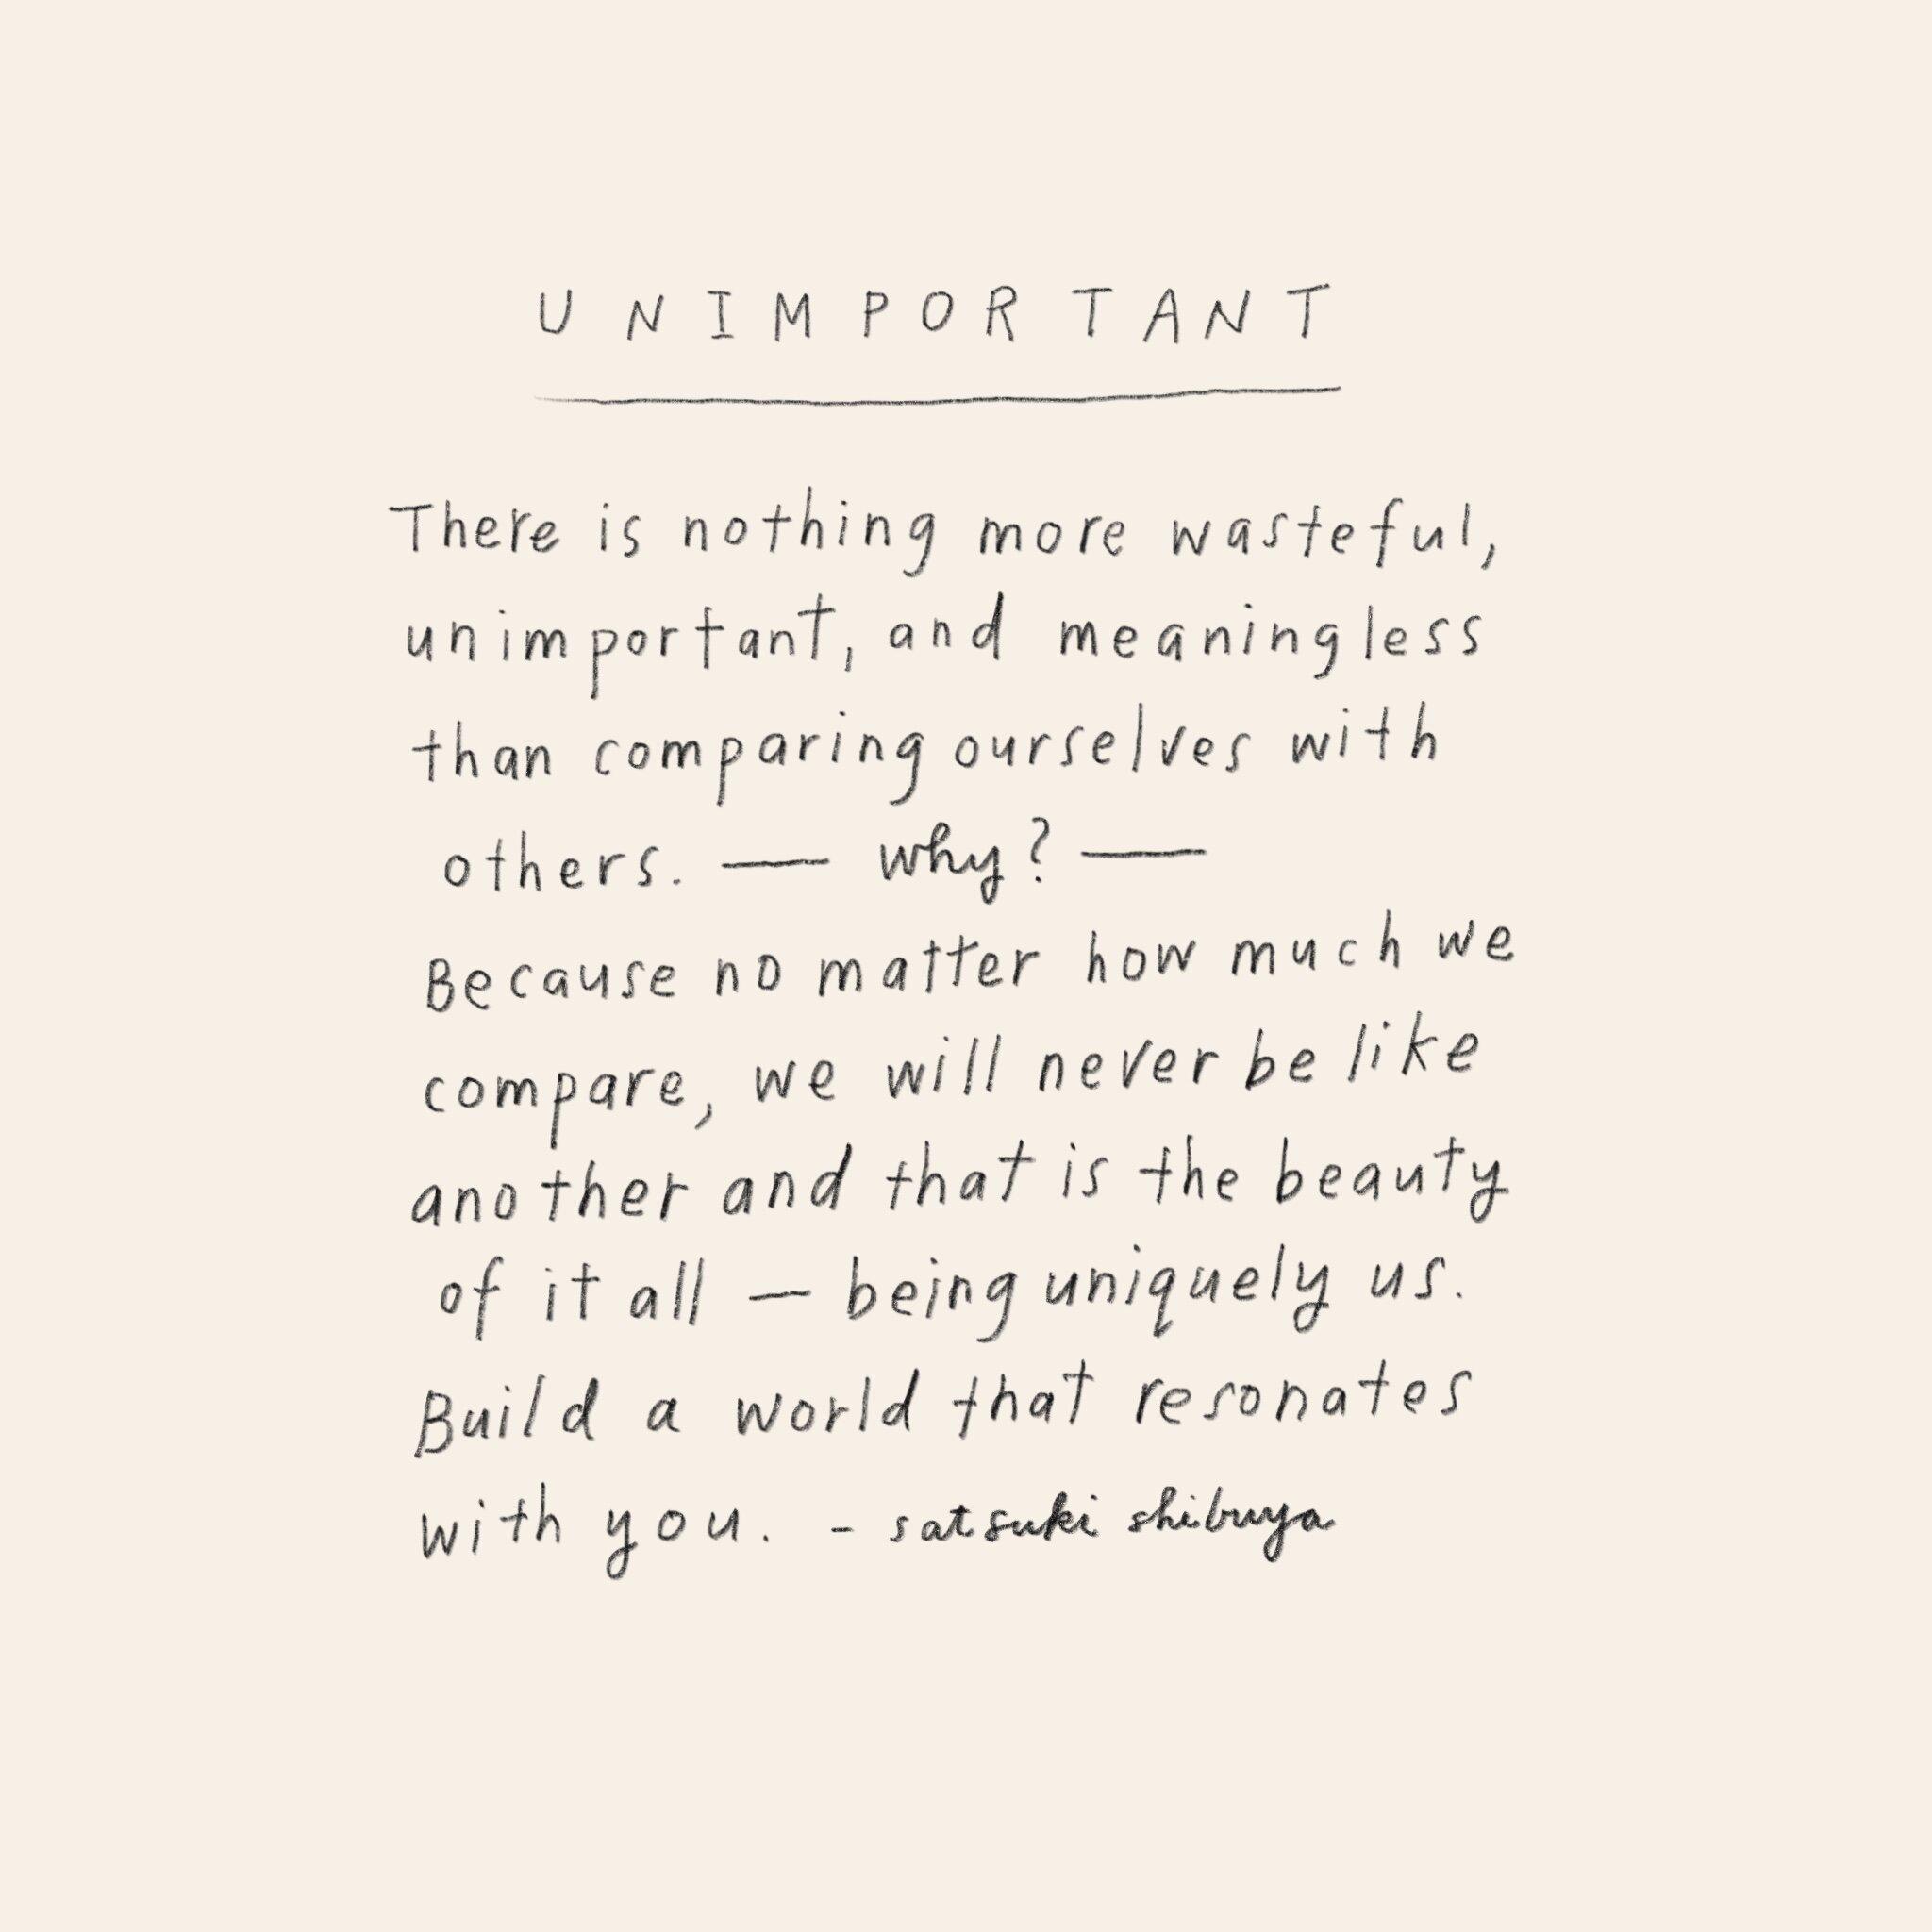 unimportant.jpg